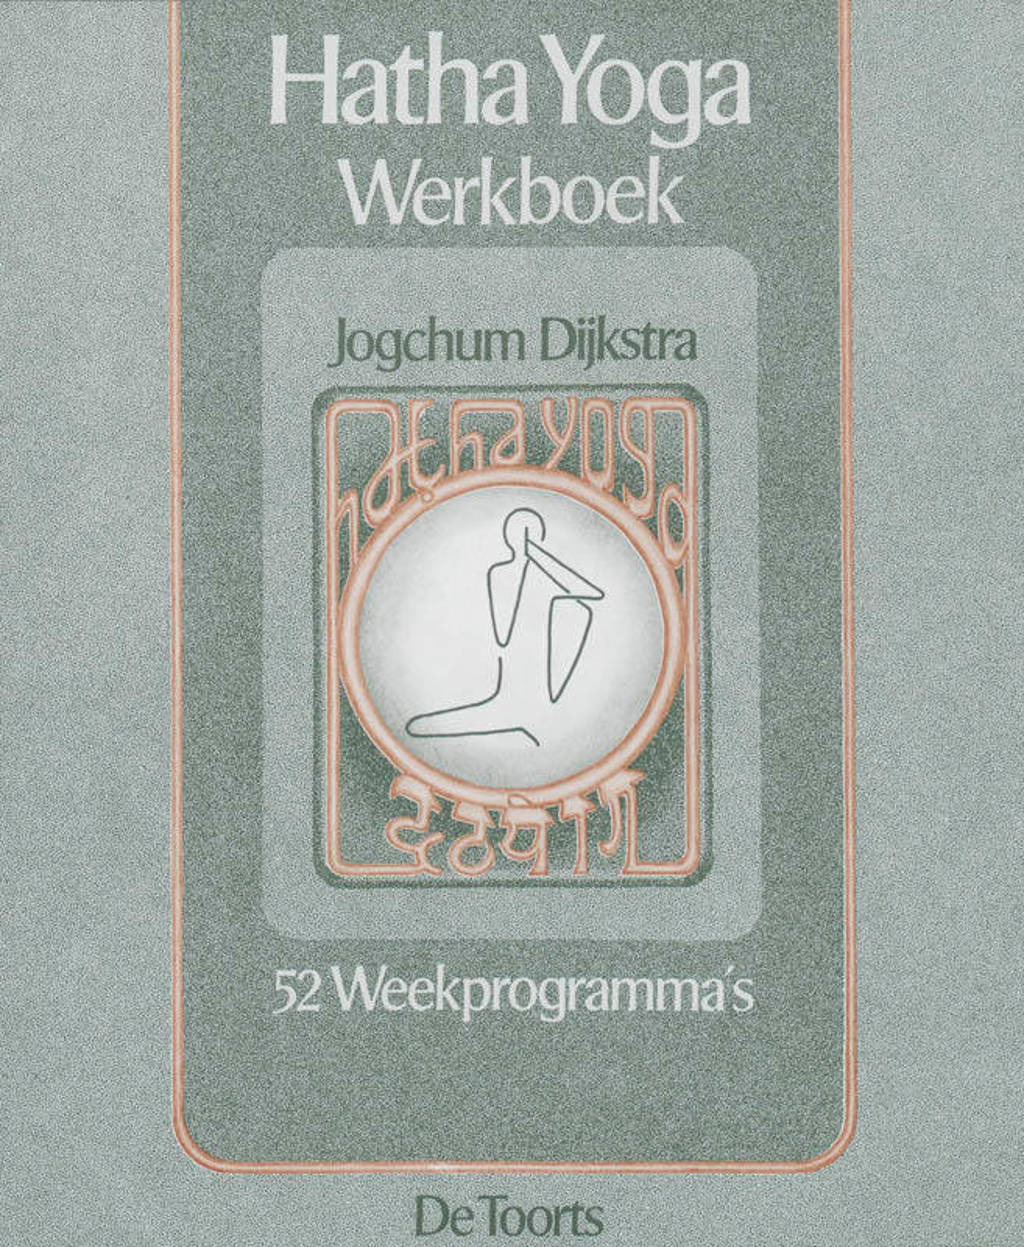 Hatha yoga - J. Dijkstra